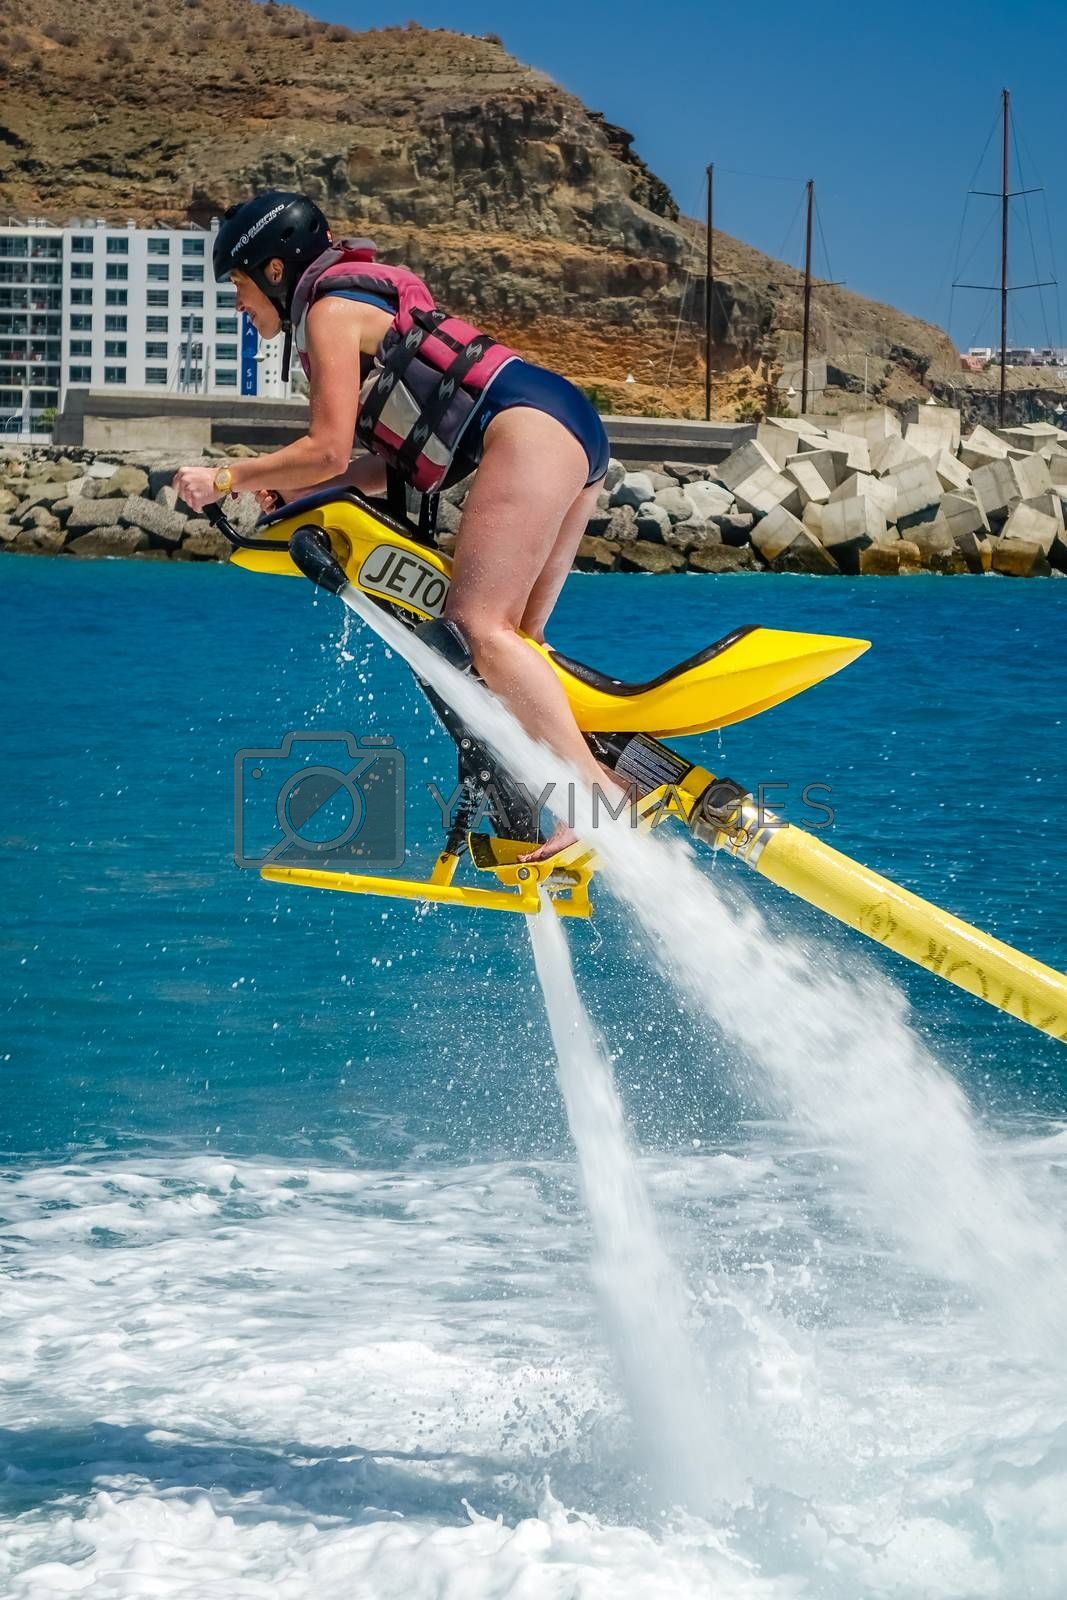 Royalty free image of Woman on a jet ski by pawopa3336